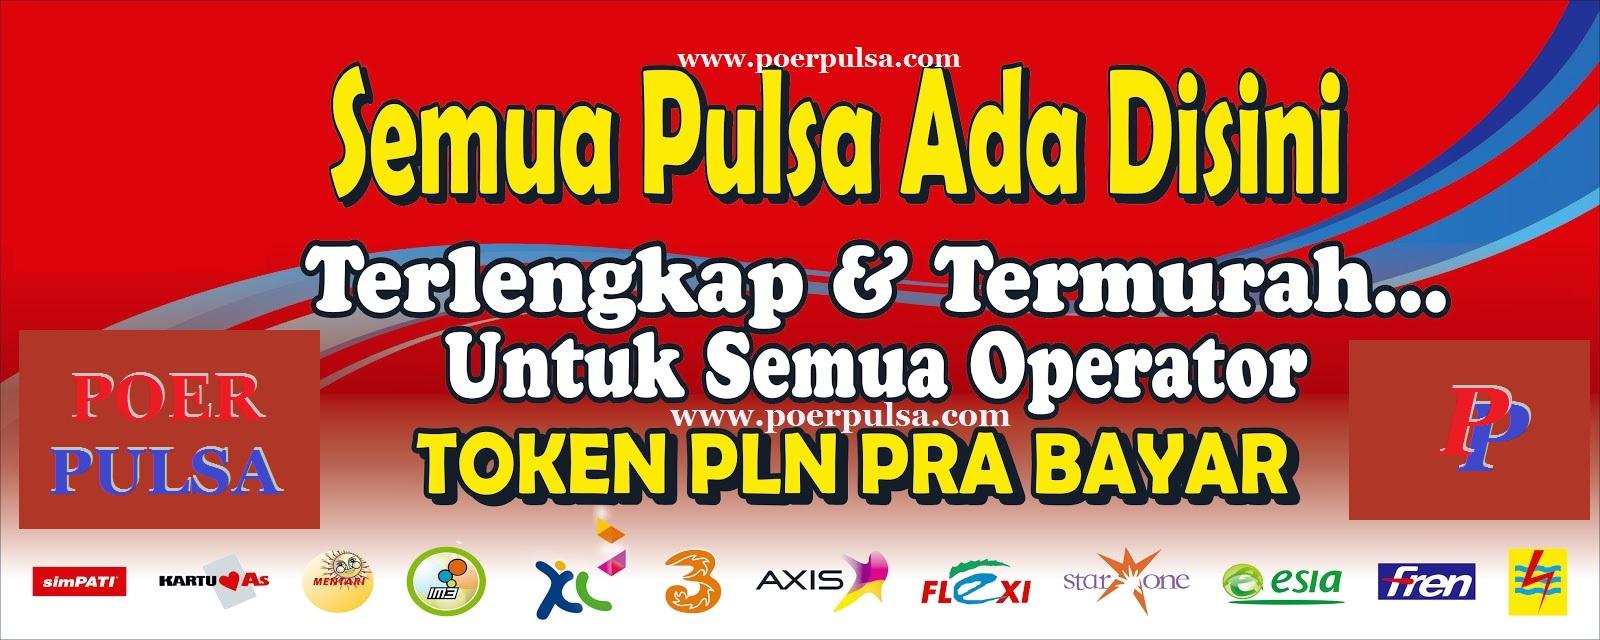 Distributor Pulsa Murah Babakancikao Purwakarta